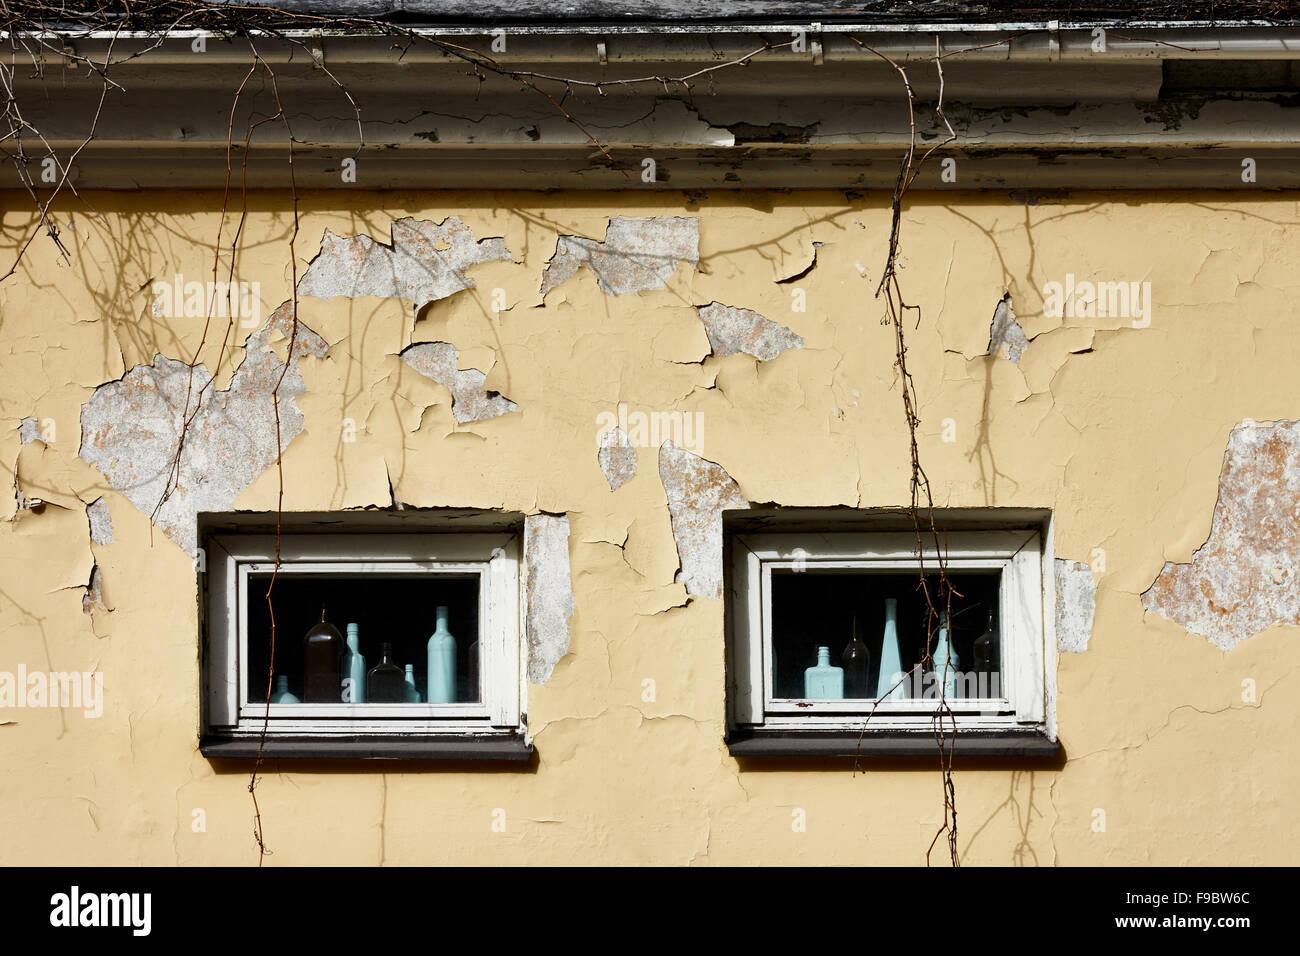 Windows of old ramshacke building - Stock Image